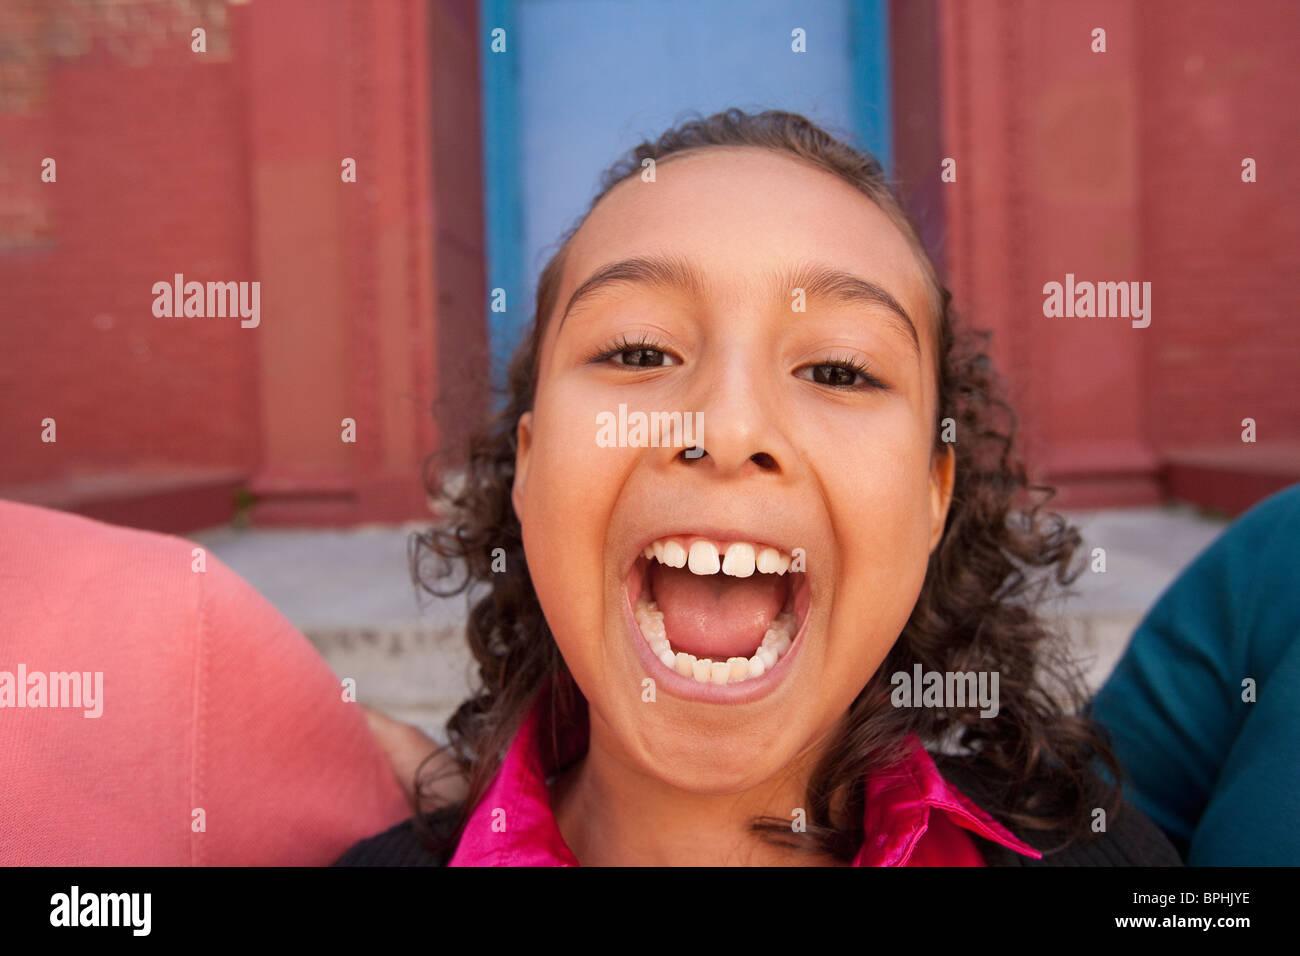 Chica hispana haciendo una cara, Boston, Massachusetts, EE.UU. Imagen De Stock